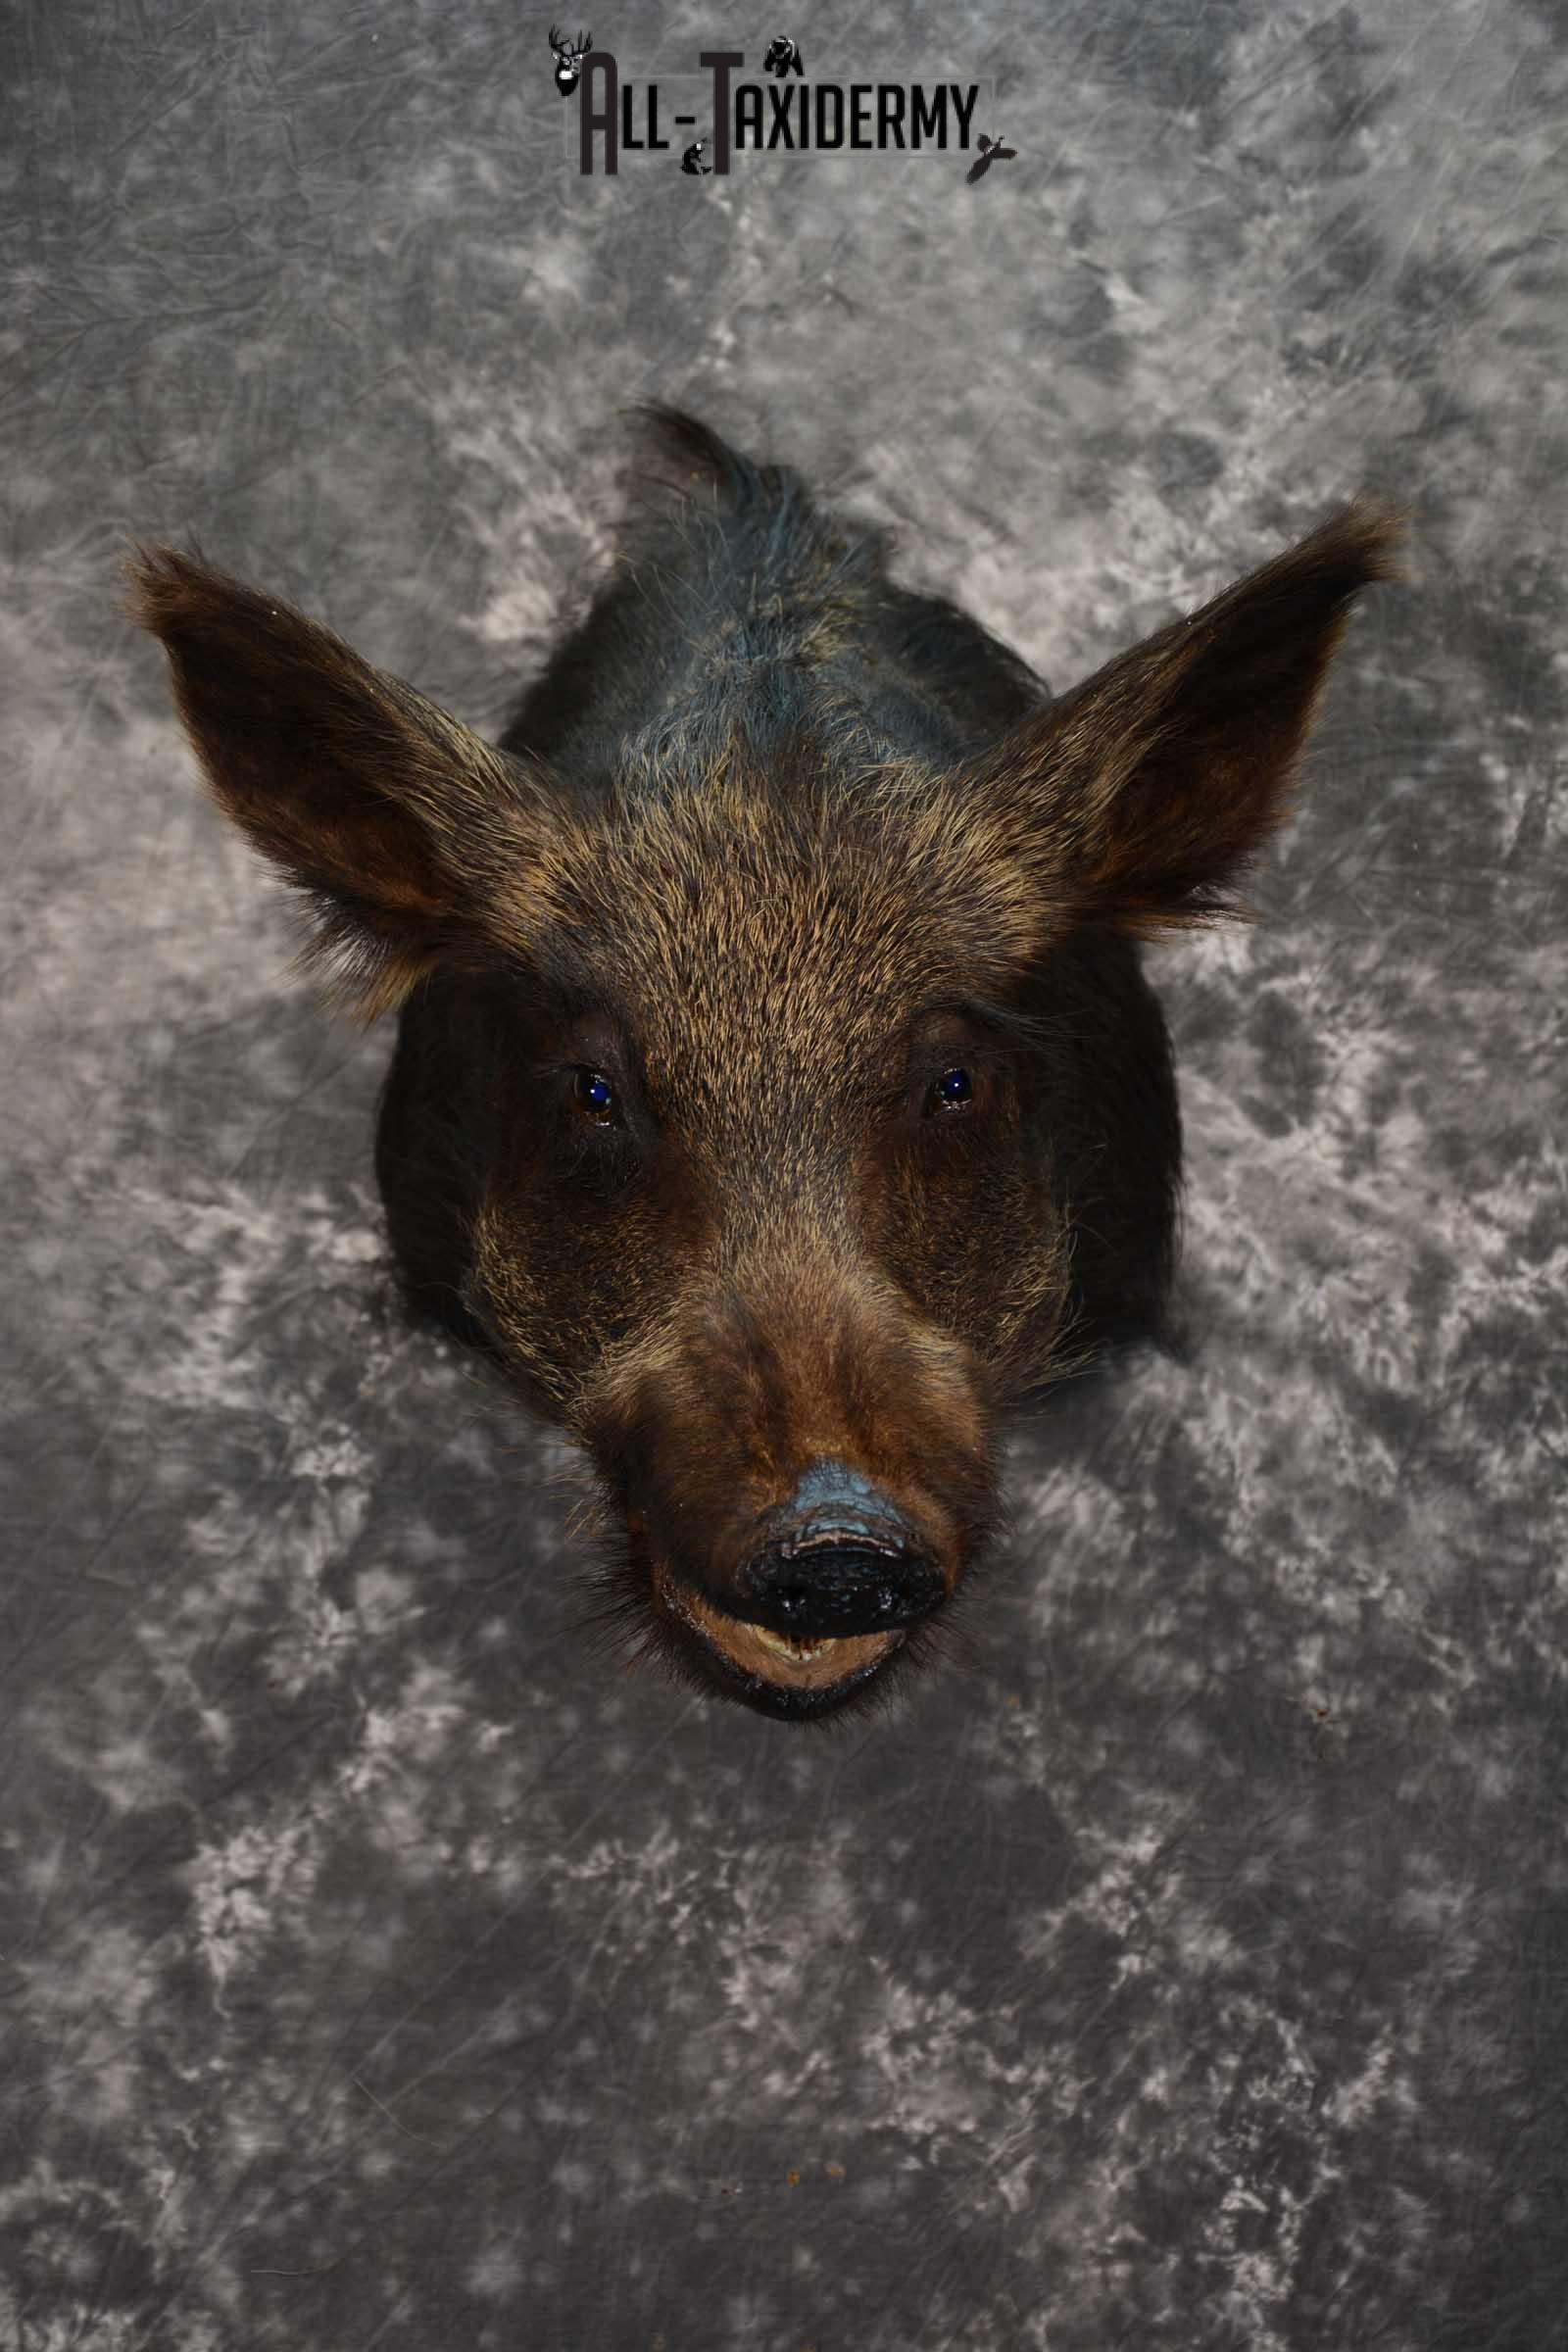 Wild Boar Taxidermy shoulder mount SKU 1624